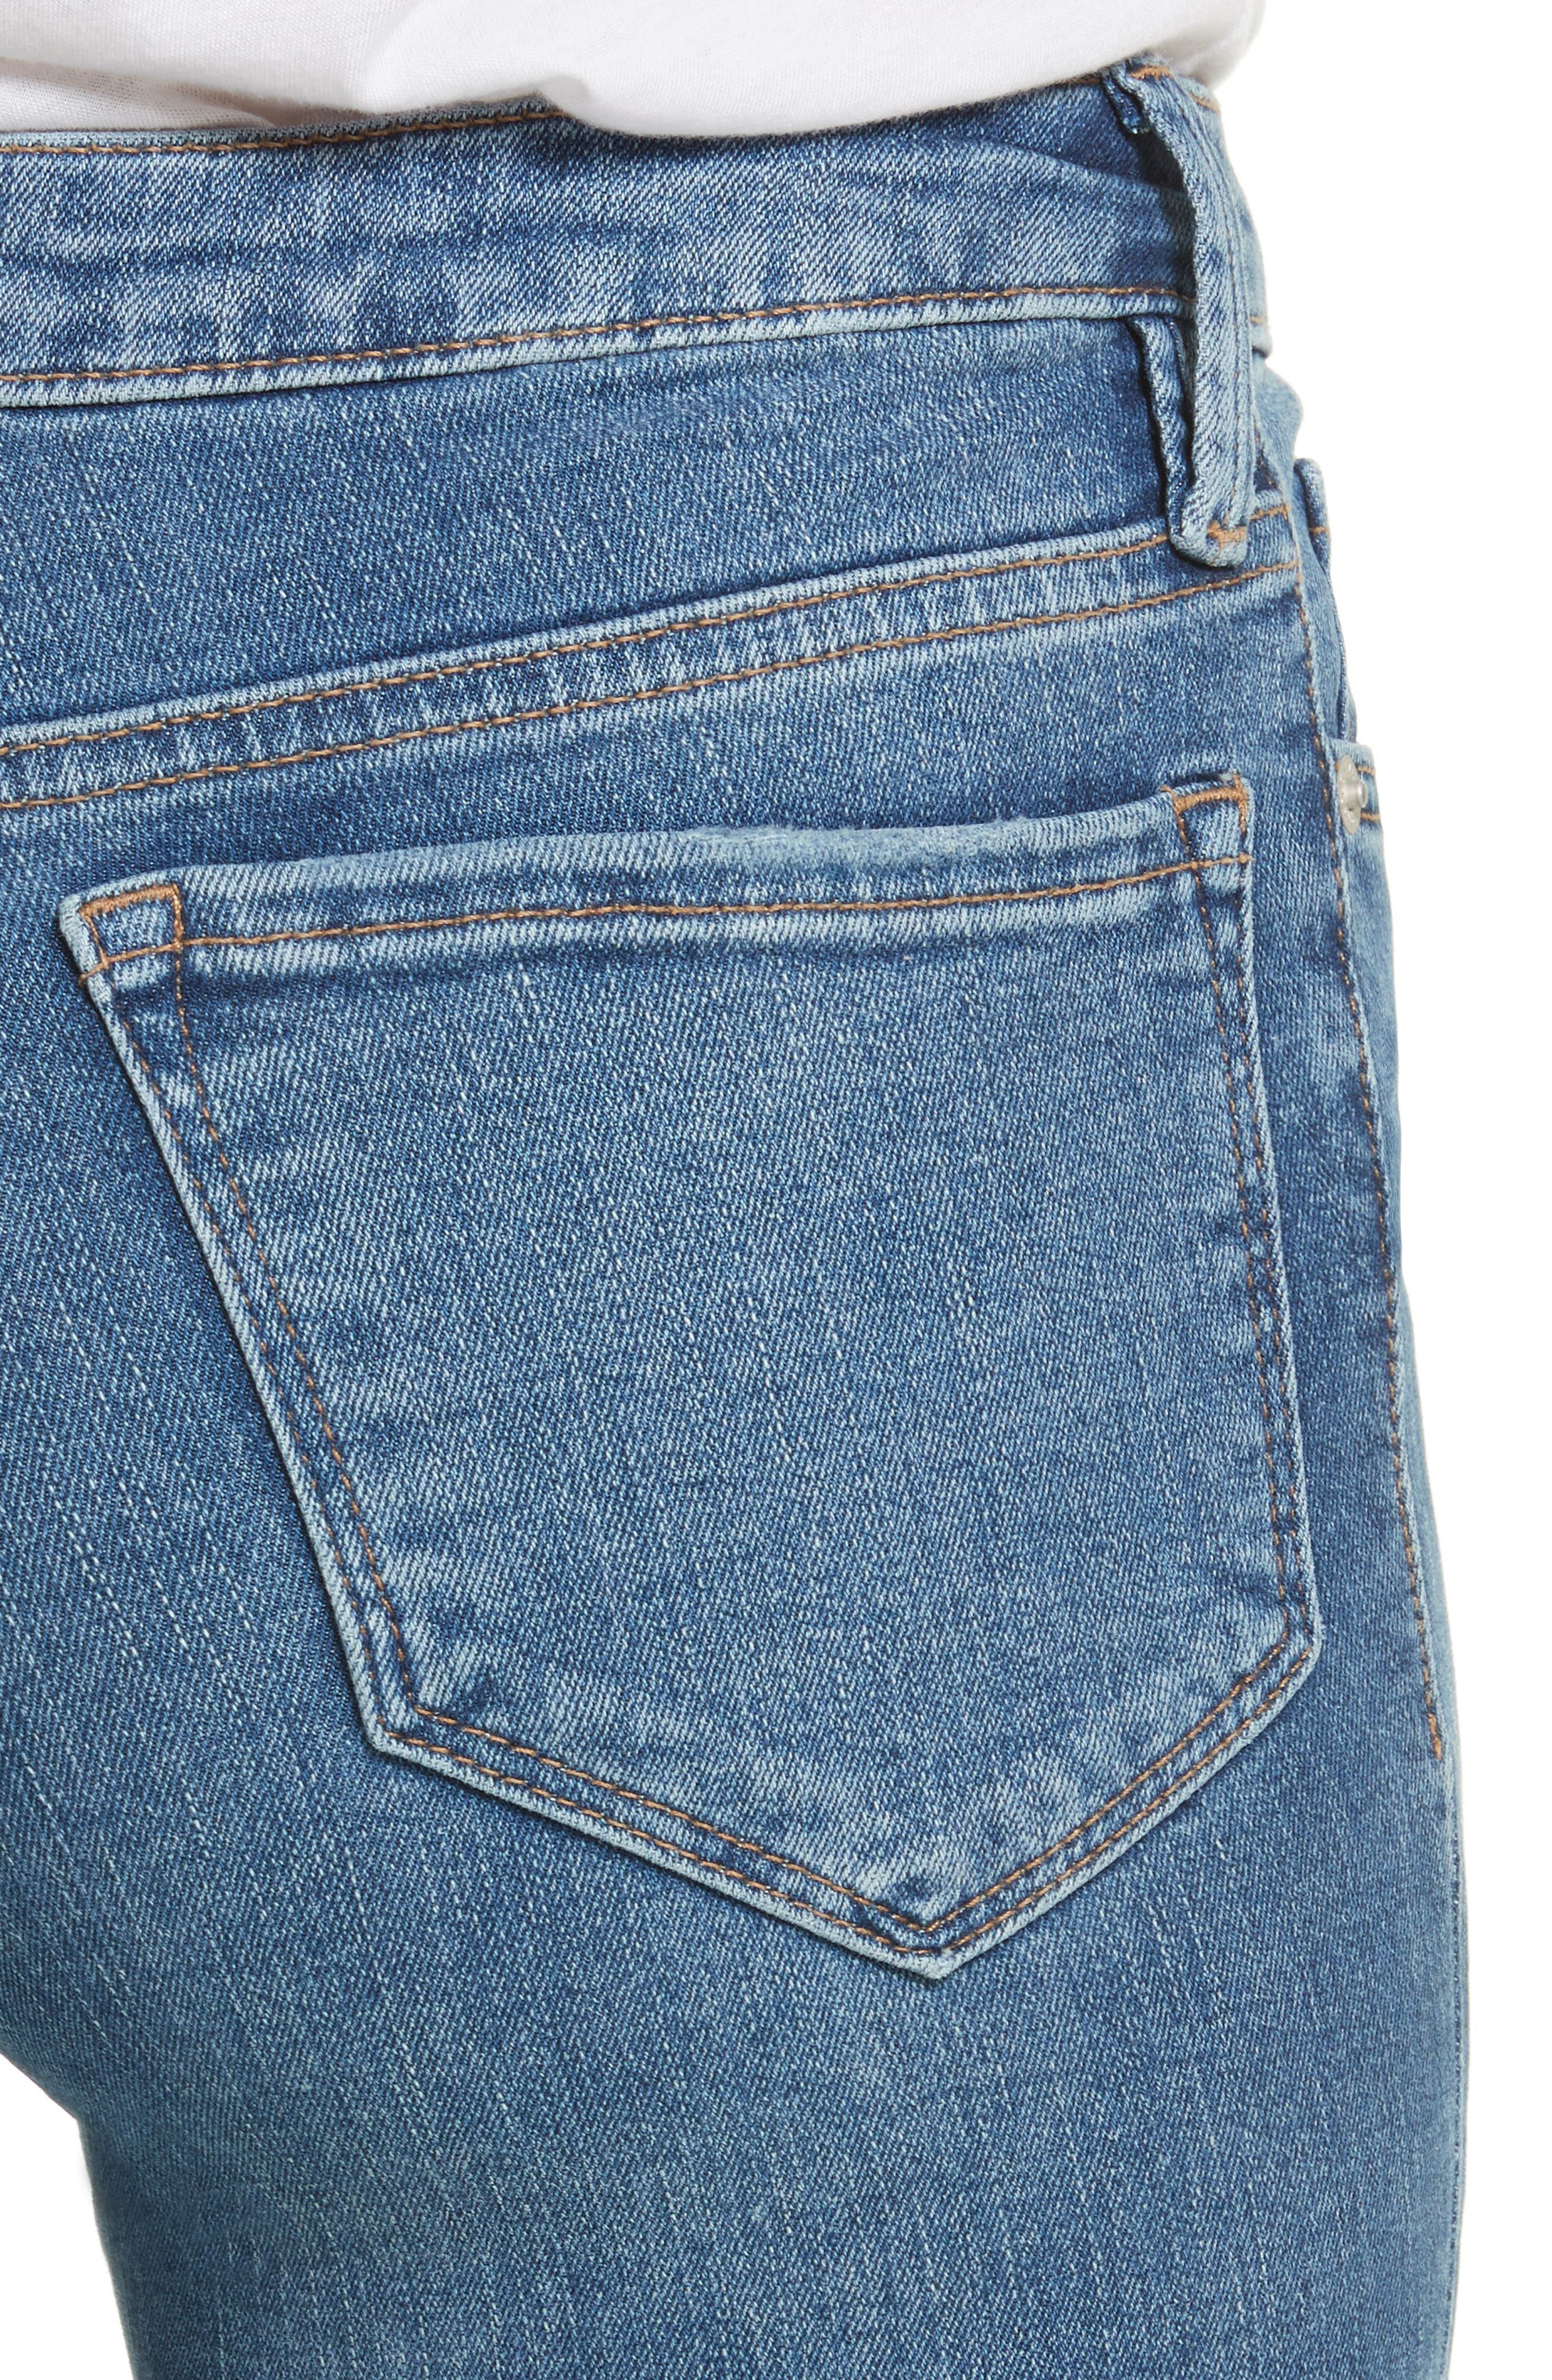 High Waist Crop Straight Leg Jeans,                             Alternate thumbnail 4, color,                             400